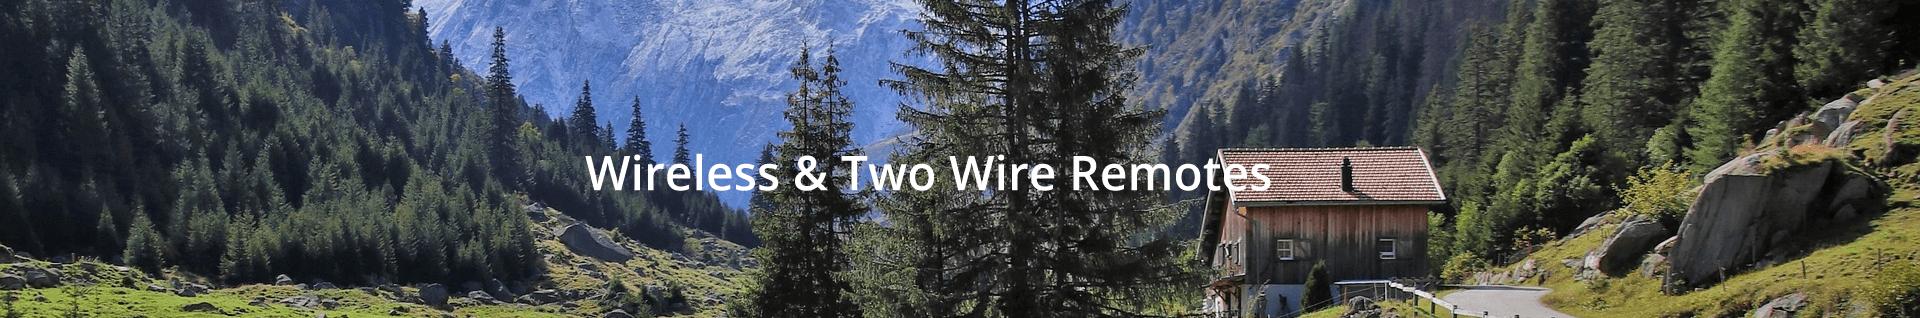 Honda Generator Wireless & Two Wire Remotes